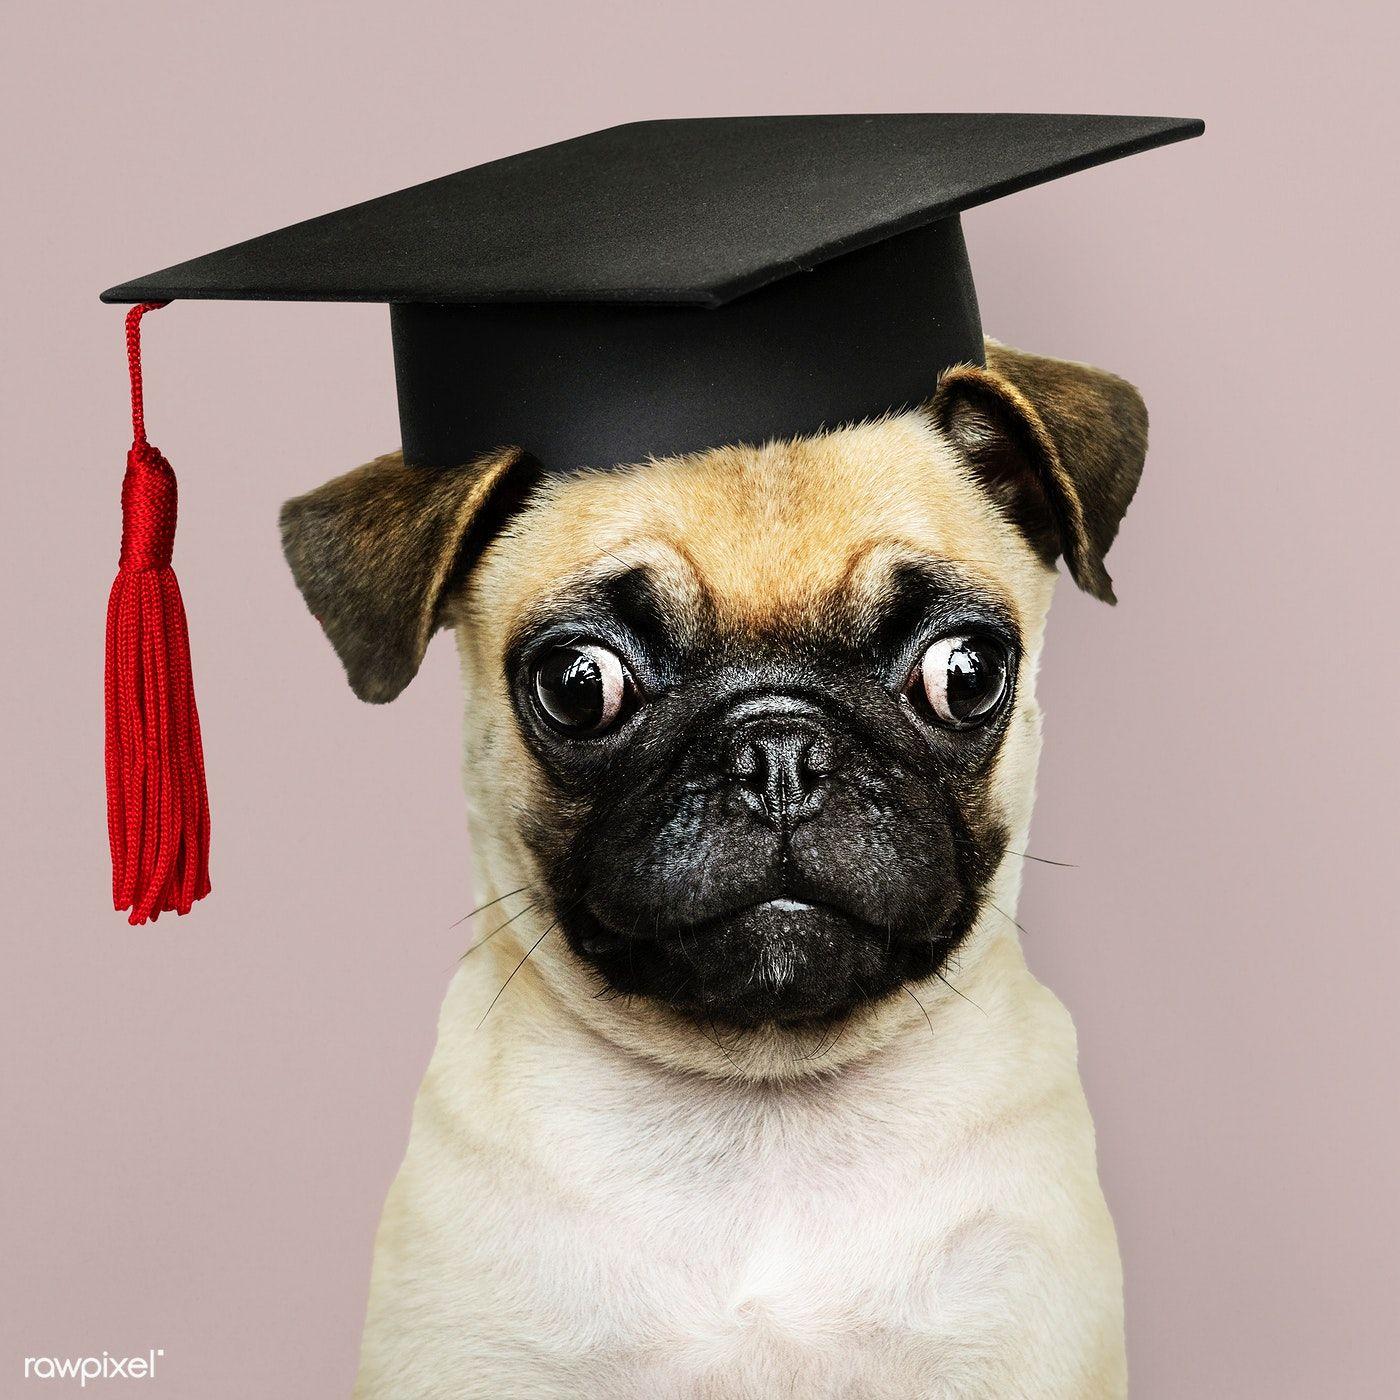 Download Premium Image Of Cute Pug Puppy In A Graduation Cap 547730 Cute Pug Puppies Cute Pugs Pug Puppy